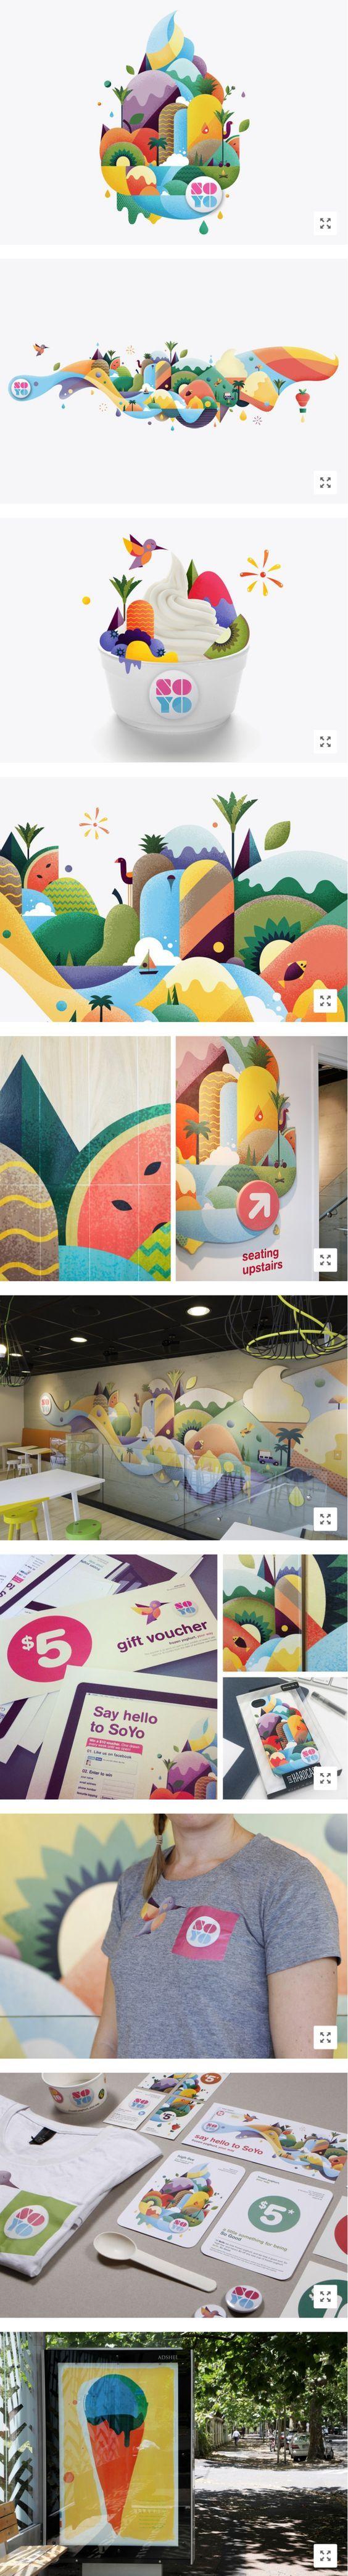 p-新西兰最佳平面设计之平面设计艺术入选...: